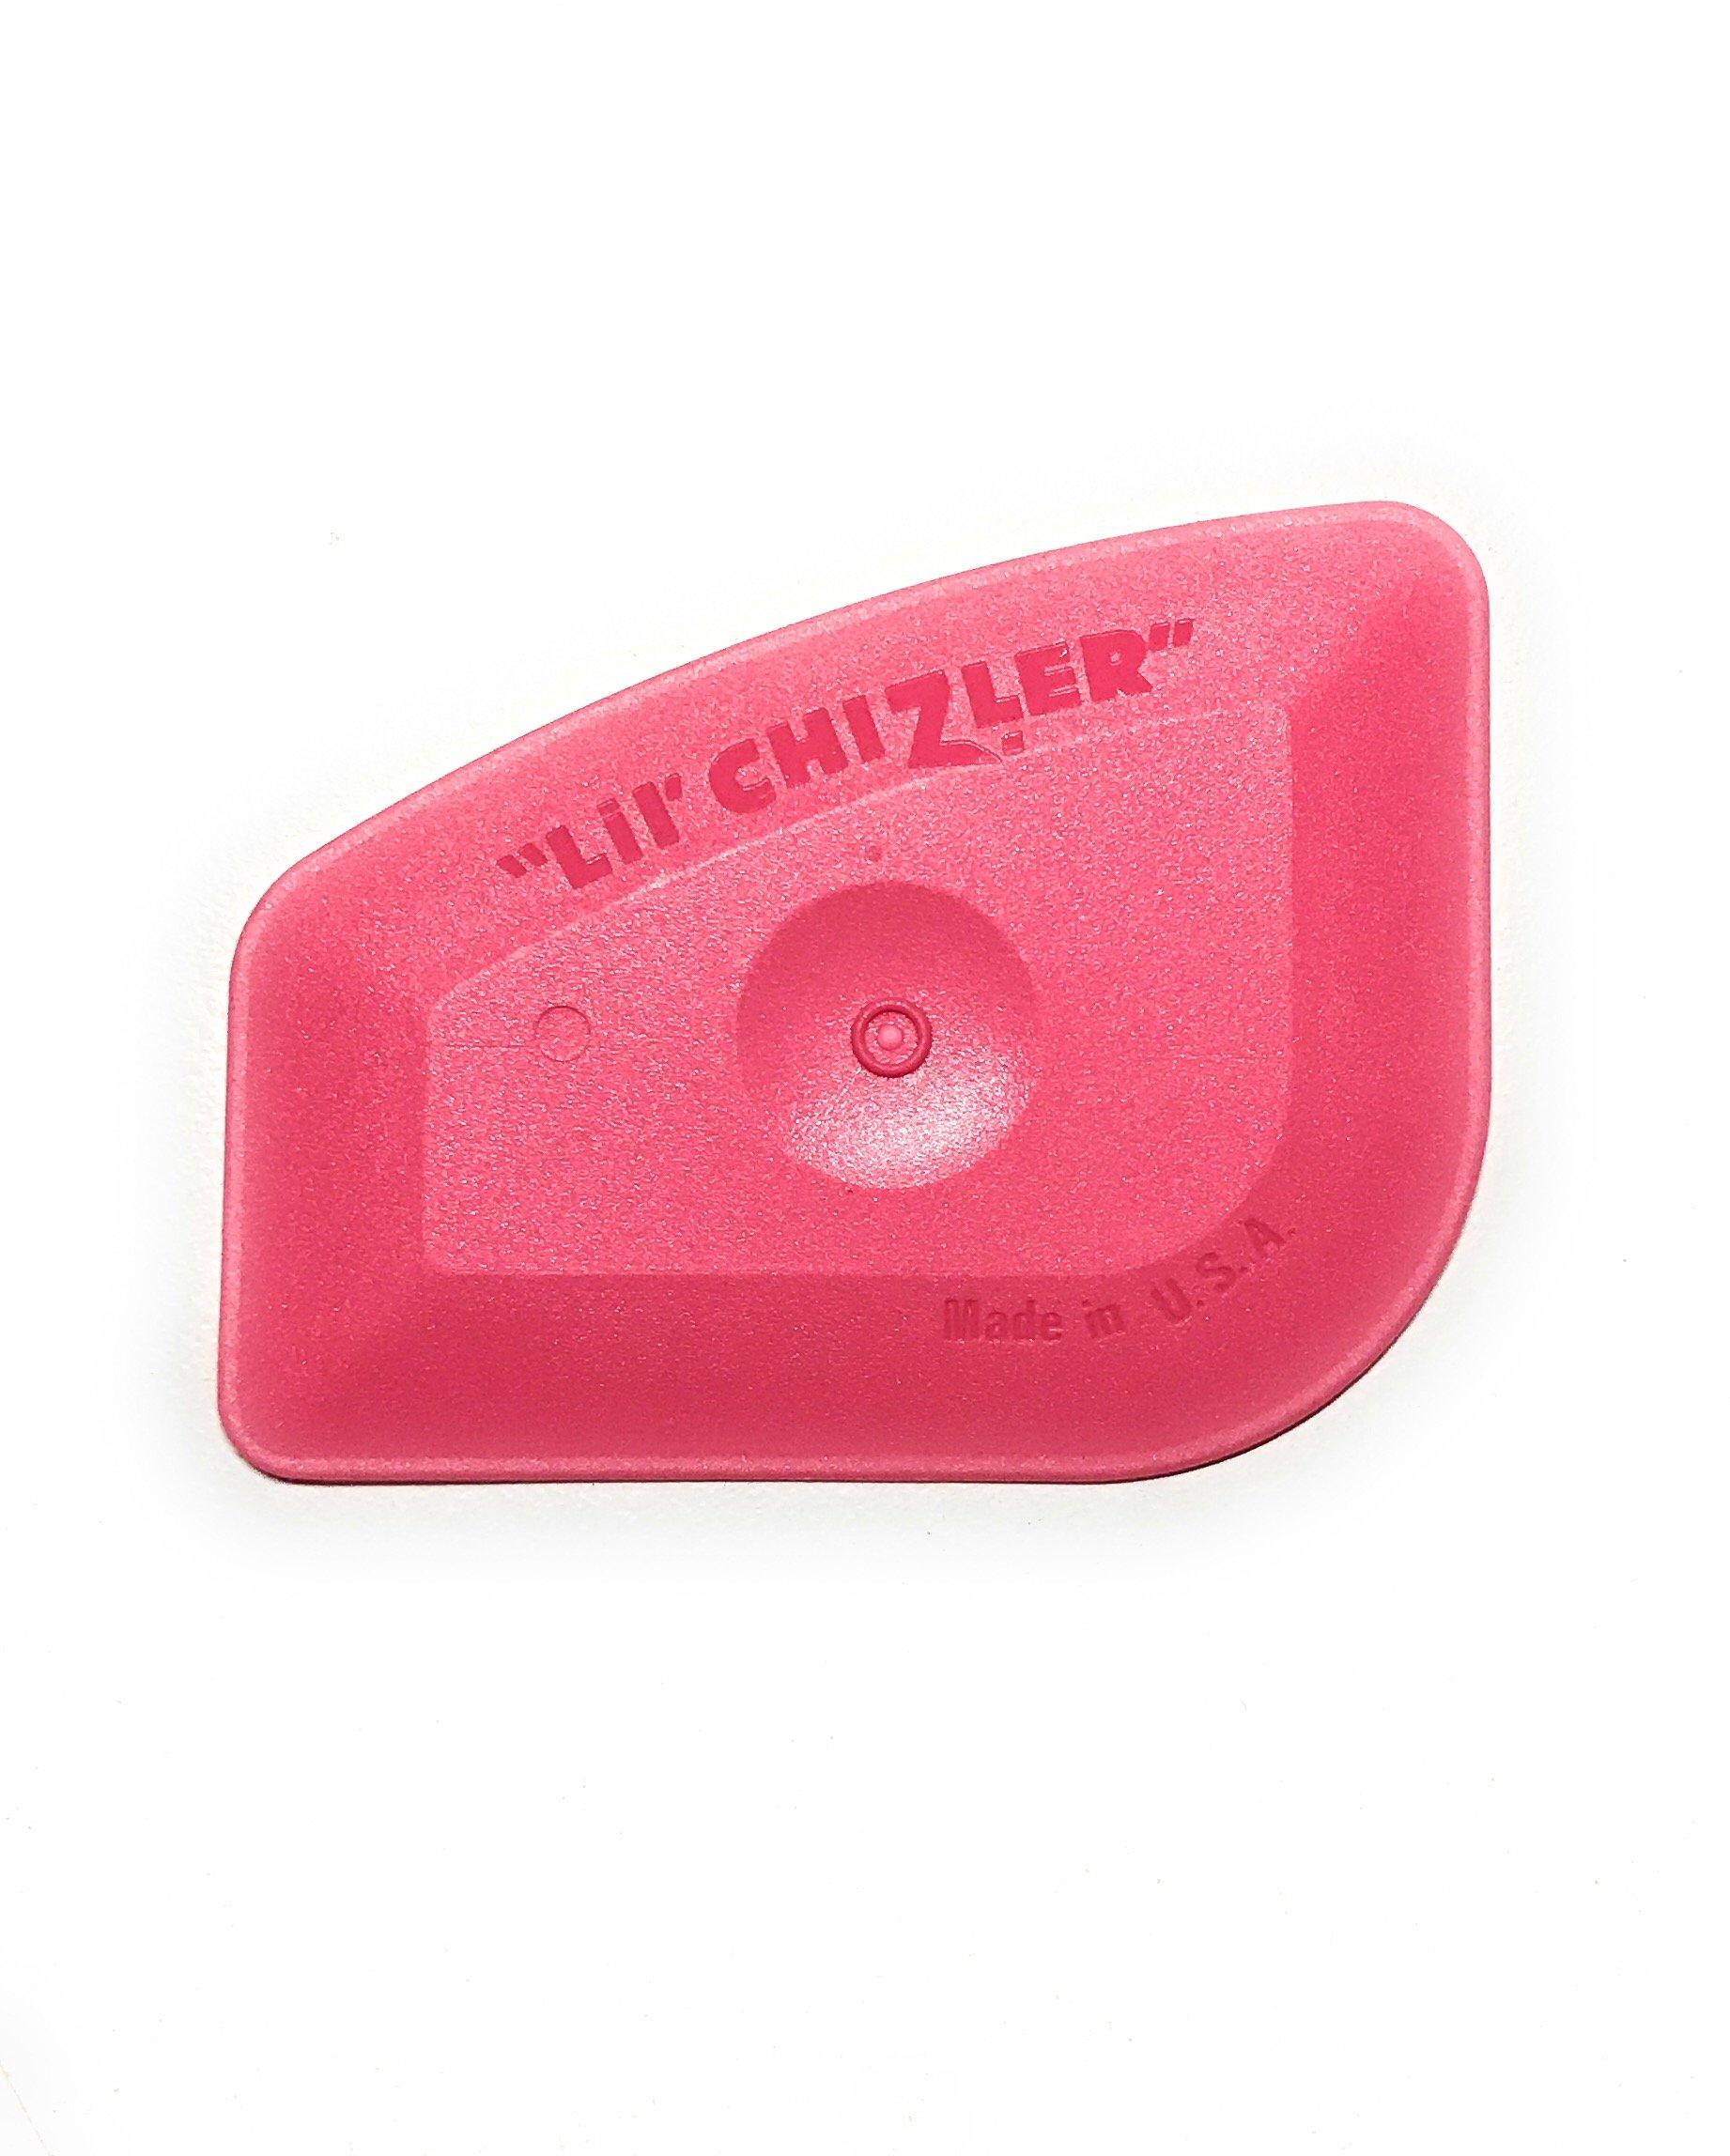 Lil Chizler Vinyl Label Scraping Tool, (Pack of 50)